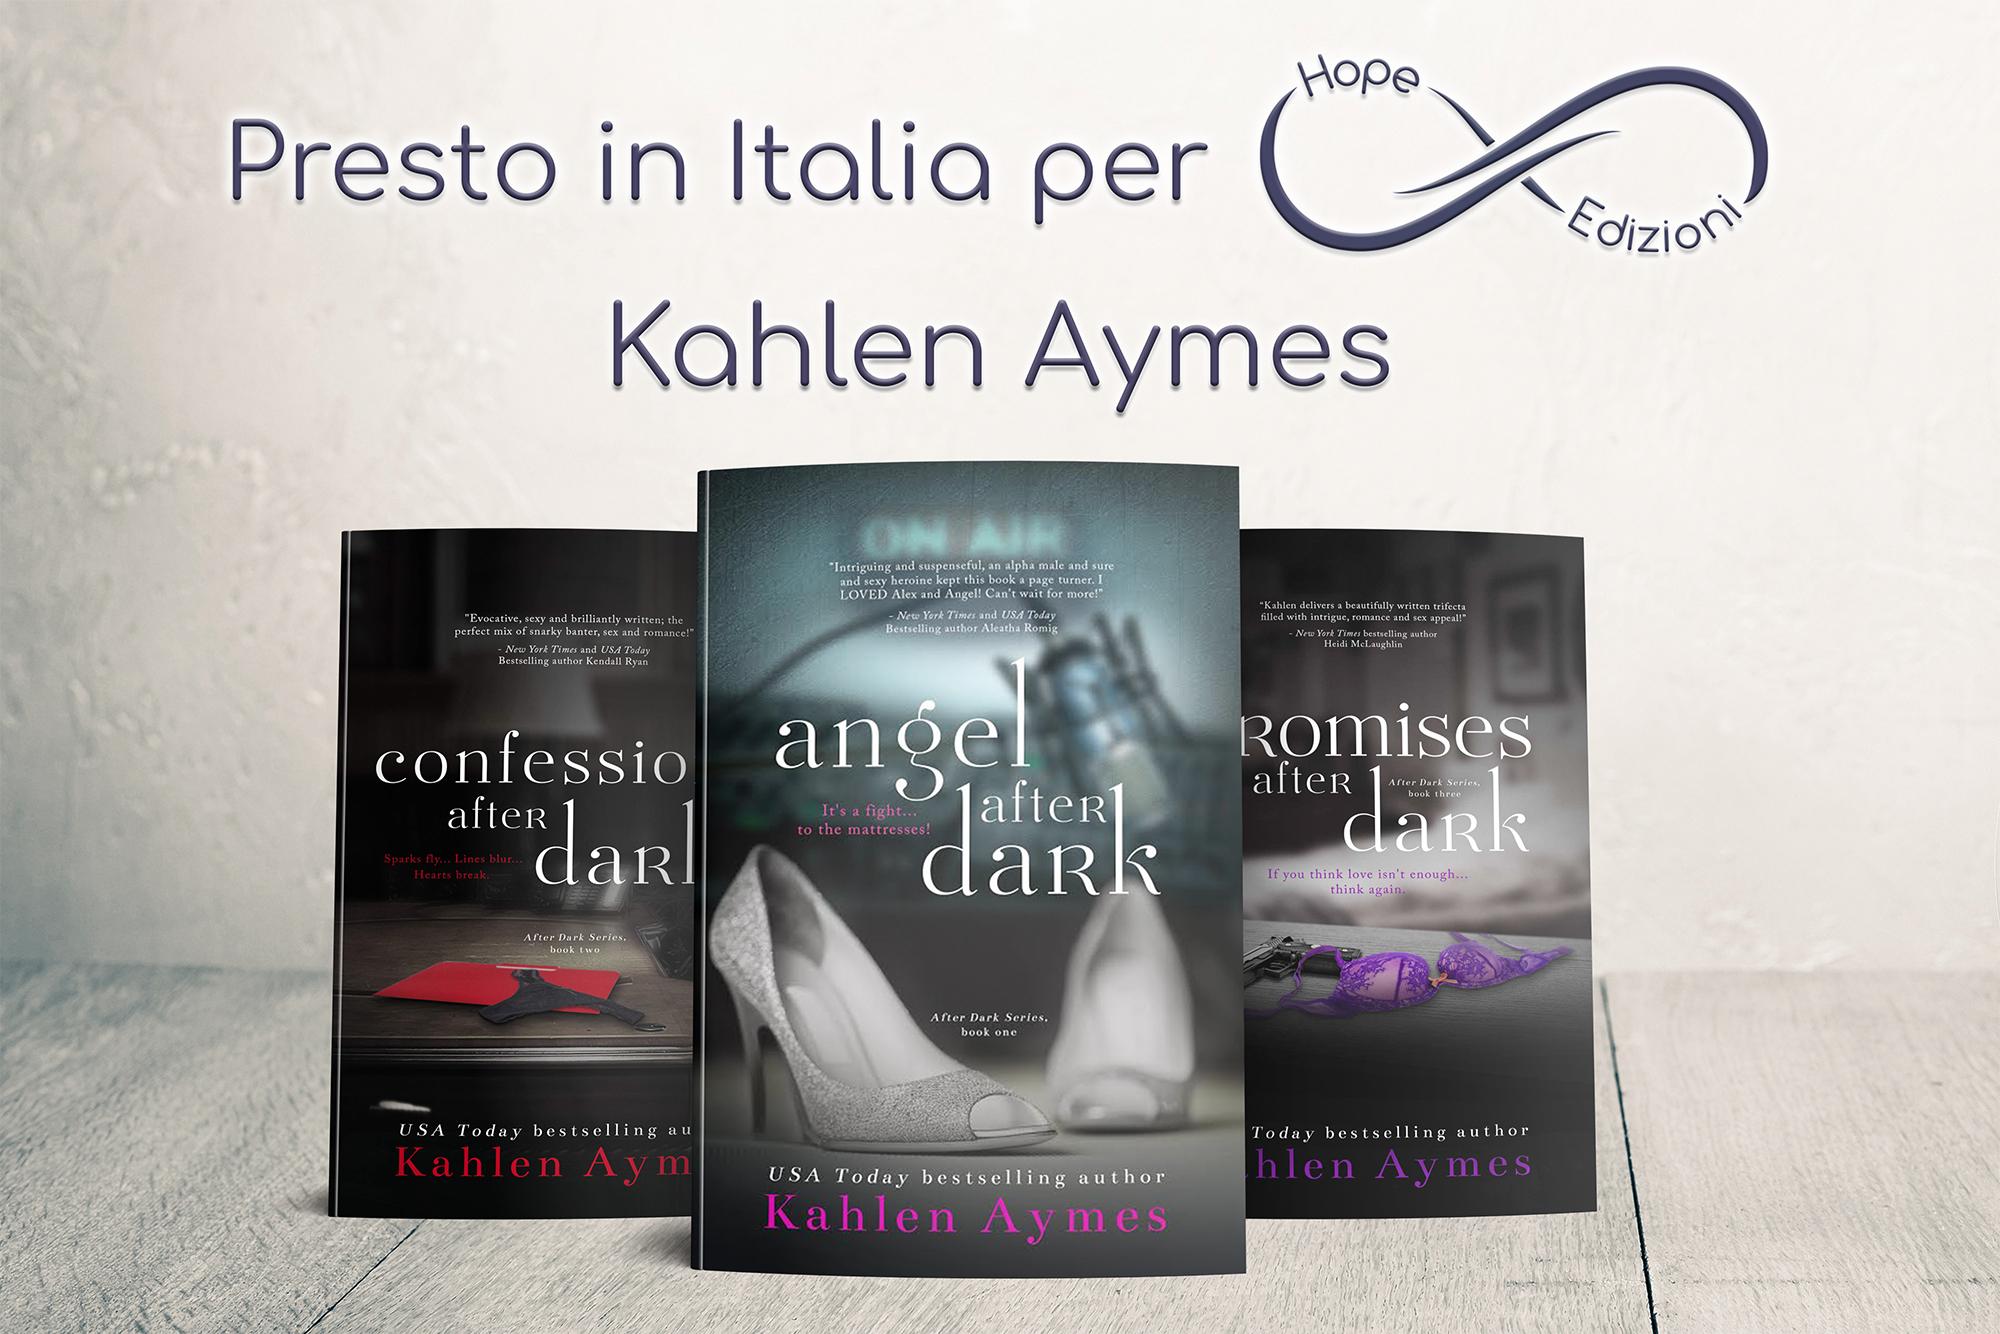 Presto in Italia… Kahlen Aymes!